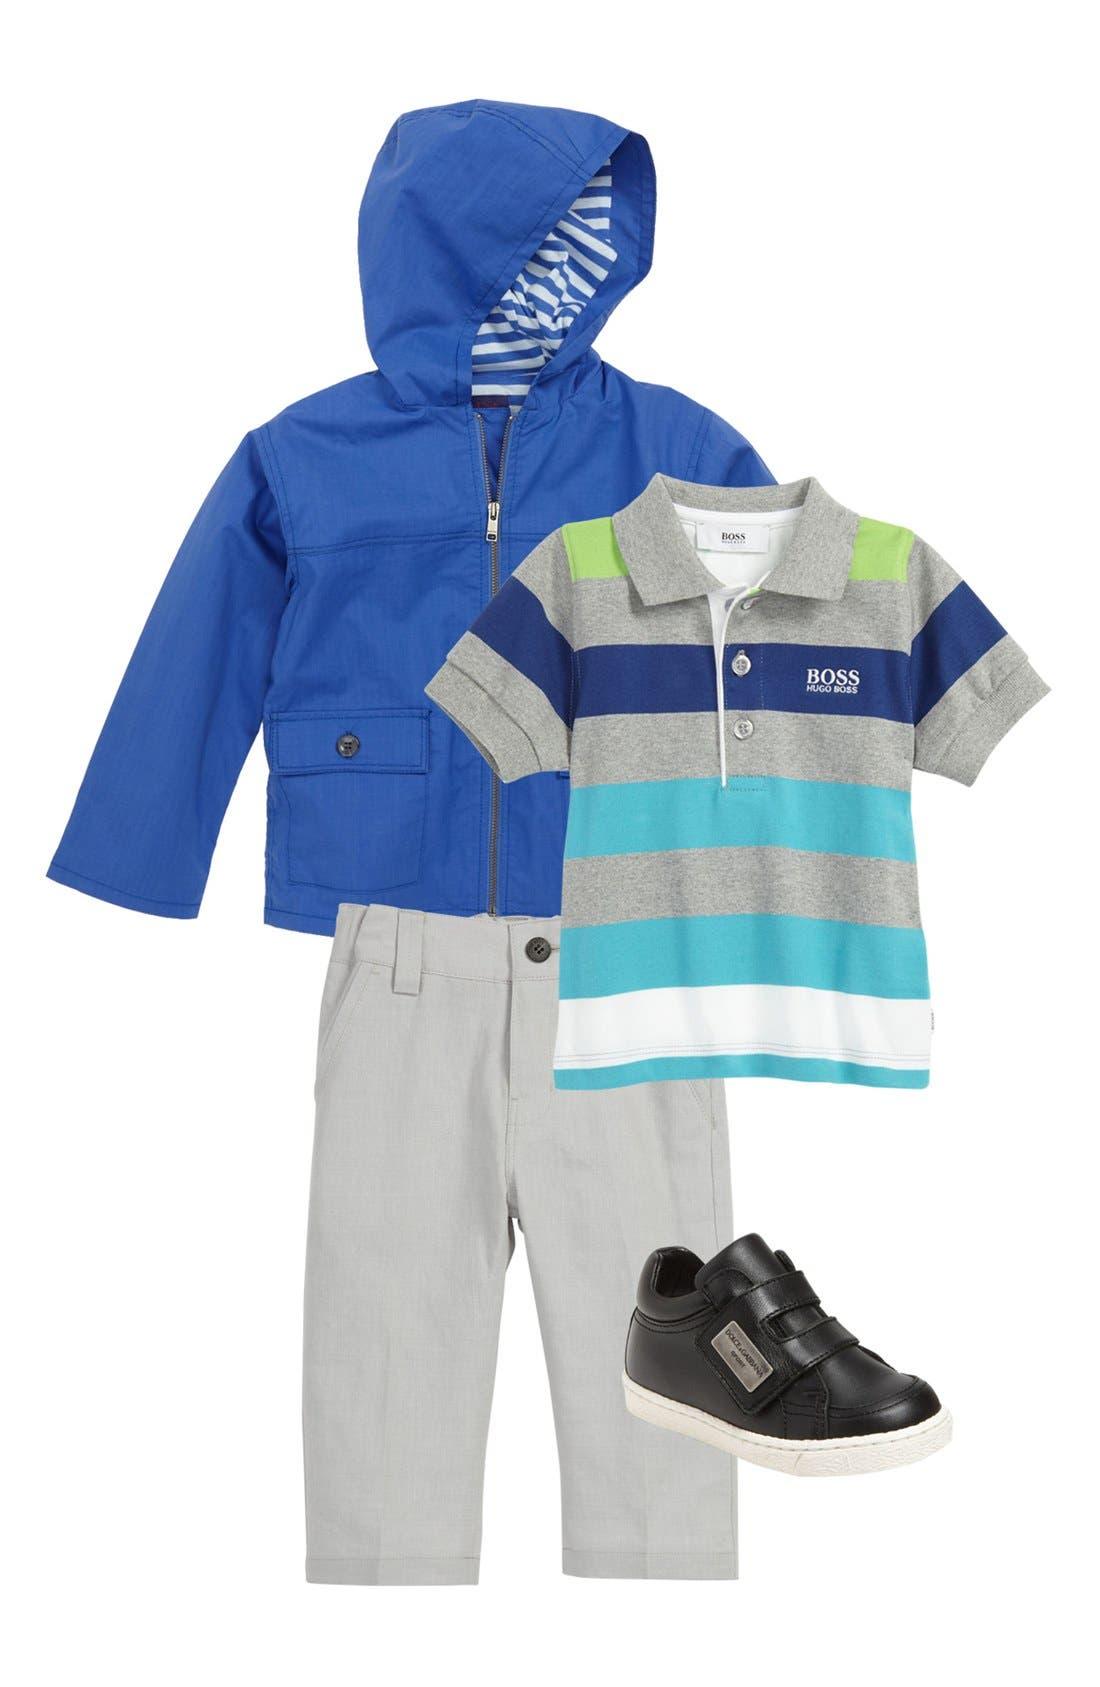 Alternate Image 1 Selected - BOSS Kidswear Polo & Pants, Paul Smith Junior Sneaker & Dolce&Gabbana Sneaker (Infant)